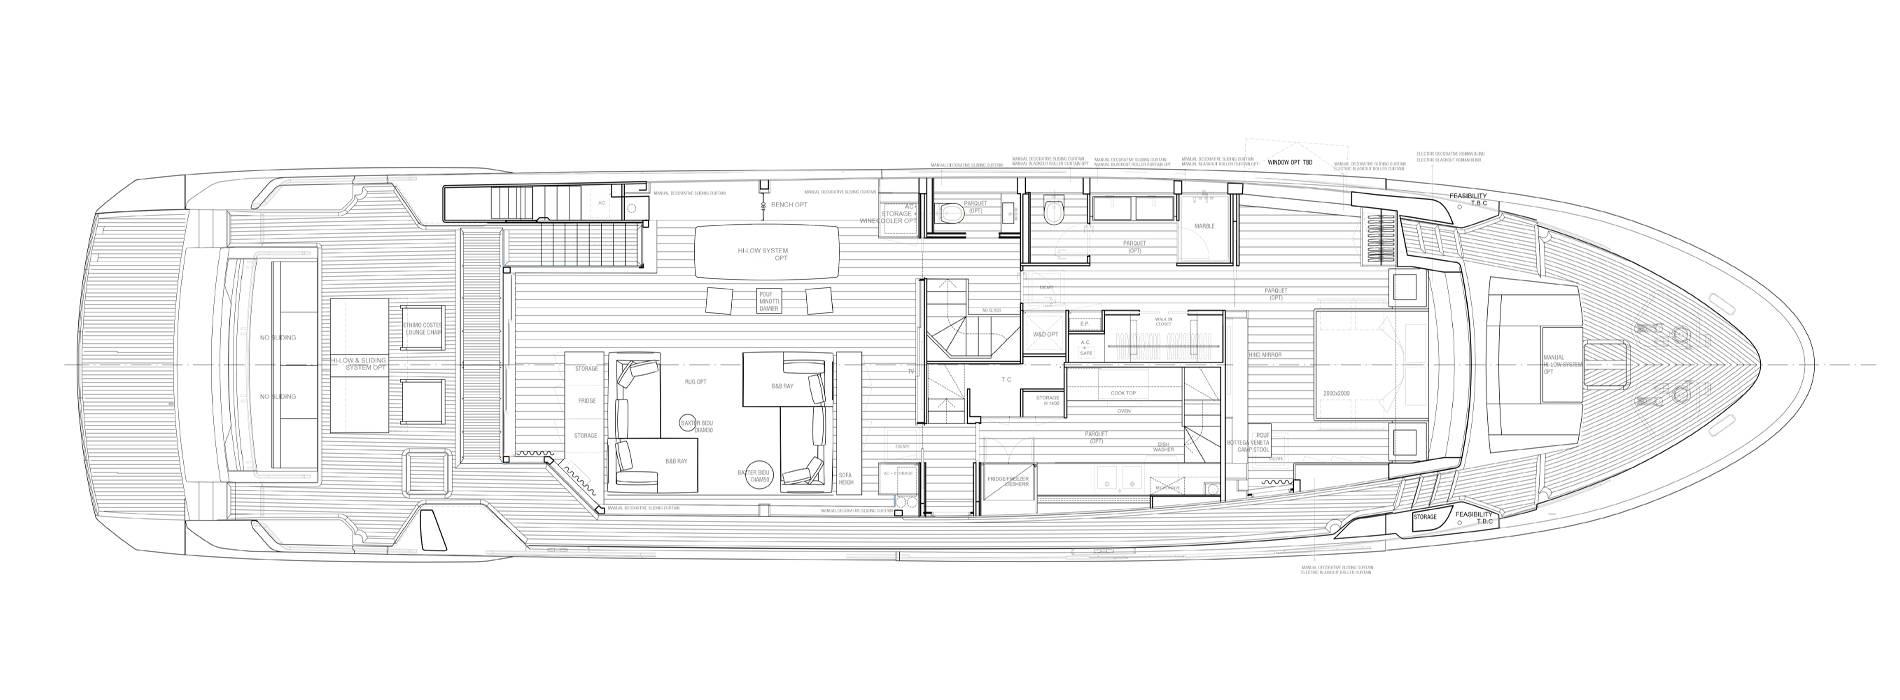 Sanlorenzo Yachts SL102A-746 主甲板